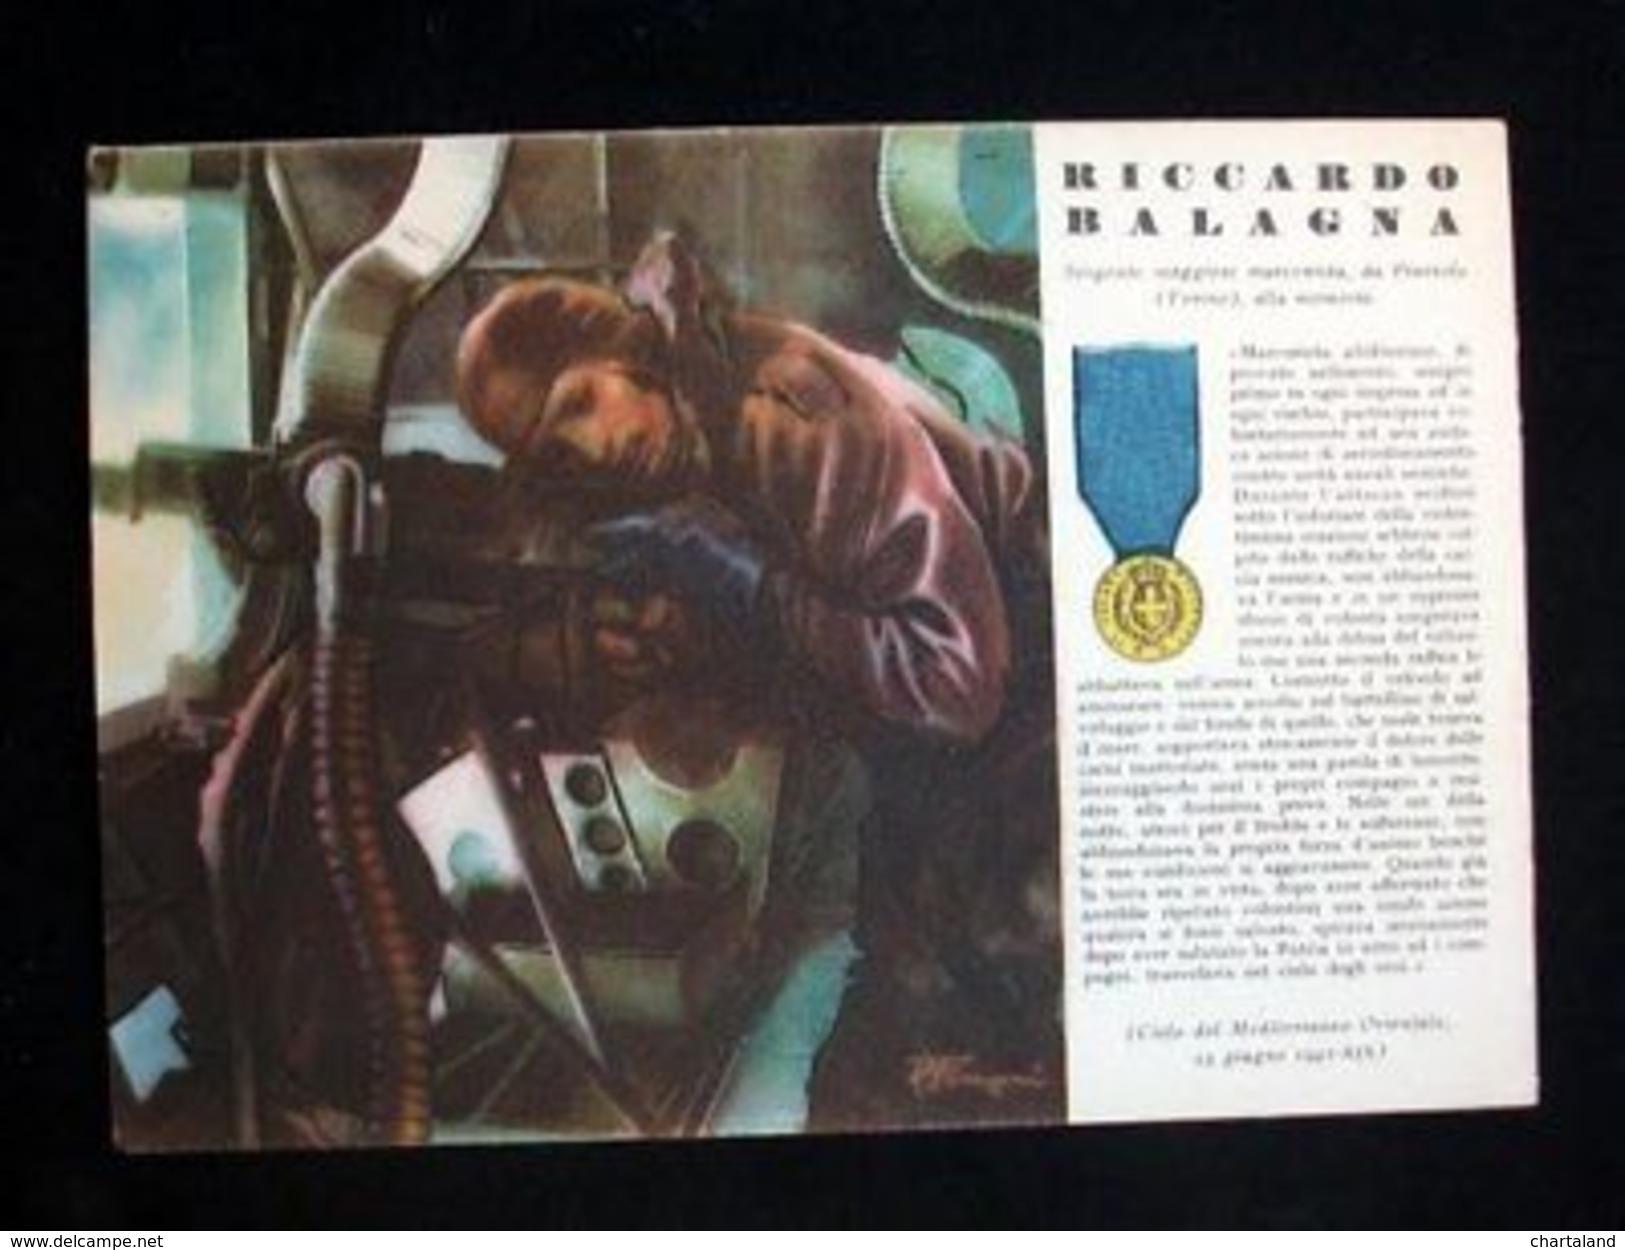 WWII Cartolina - Medaglie D' Oro Guerra 1941 - Balagna - Militari